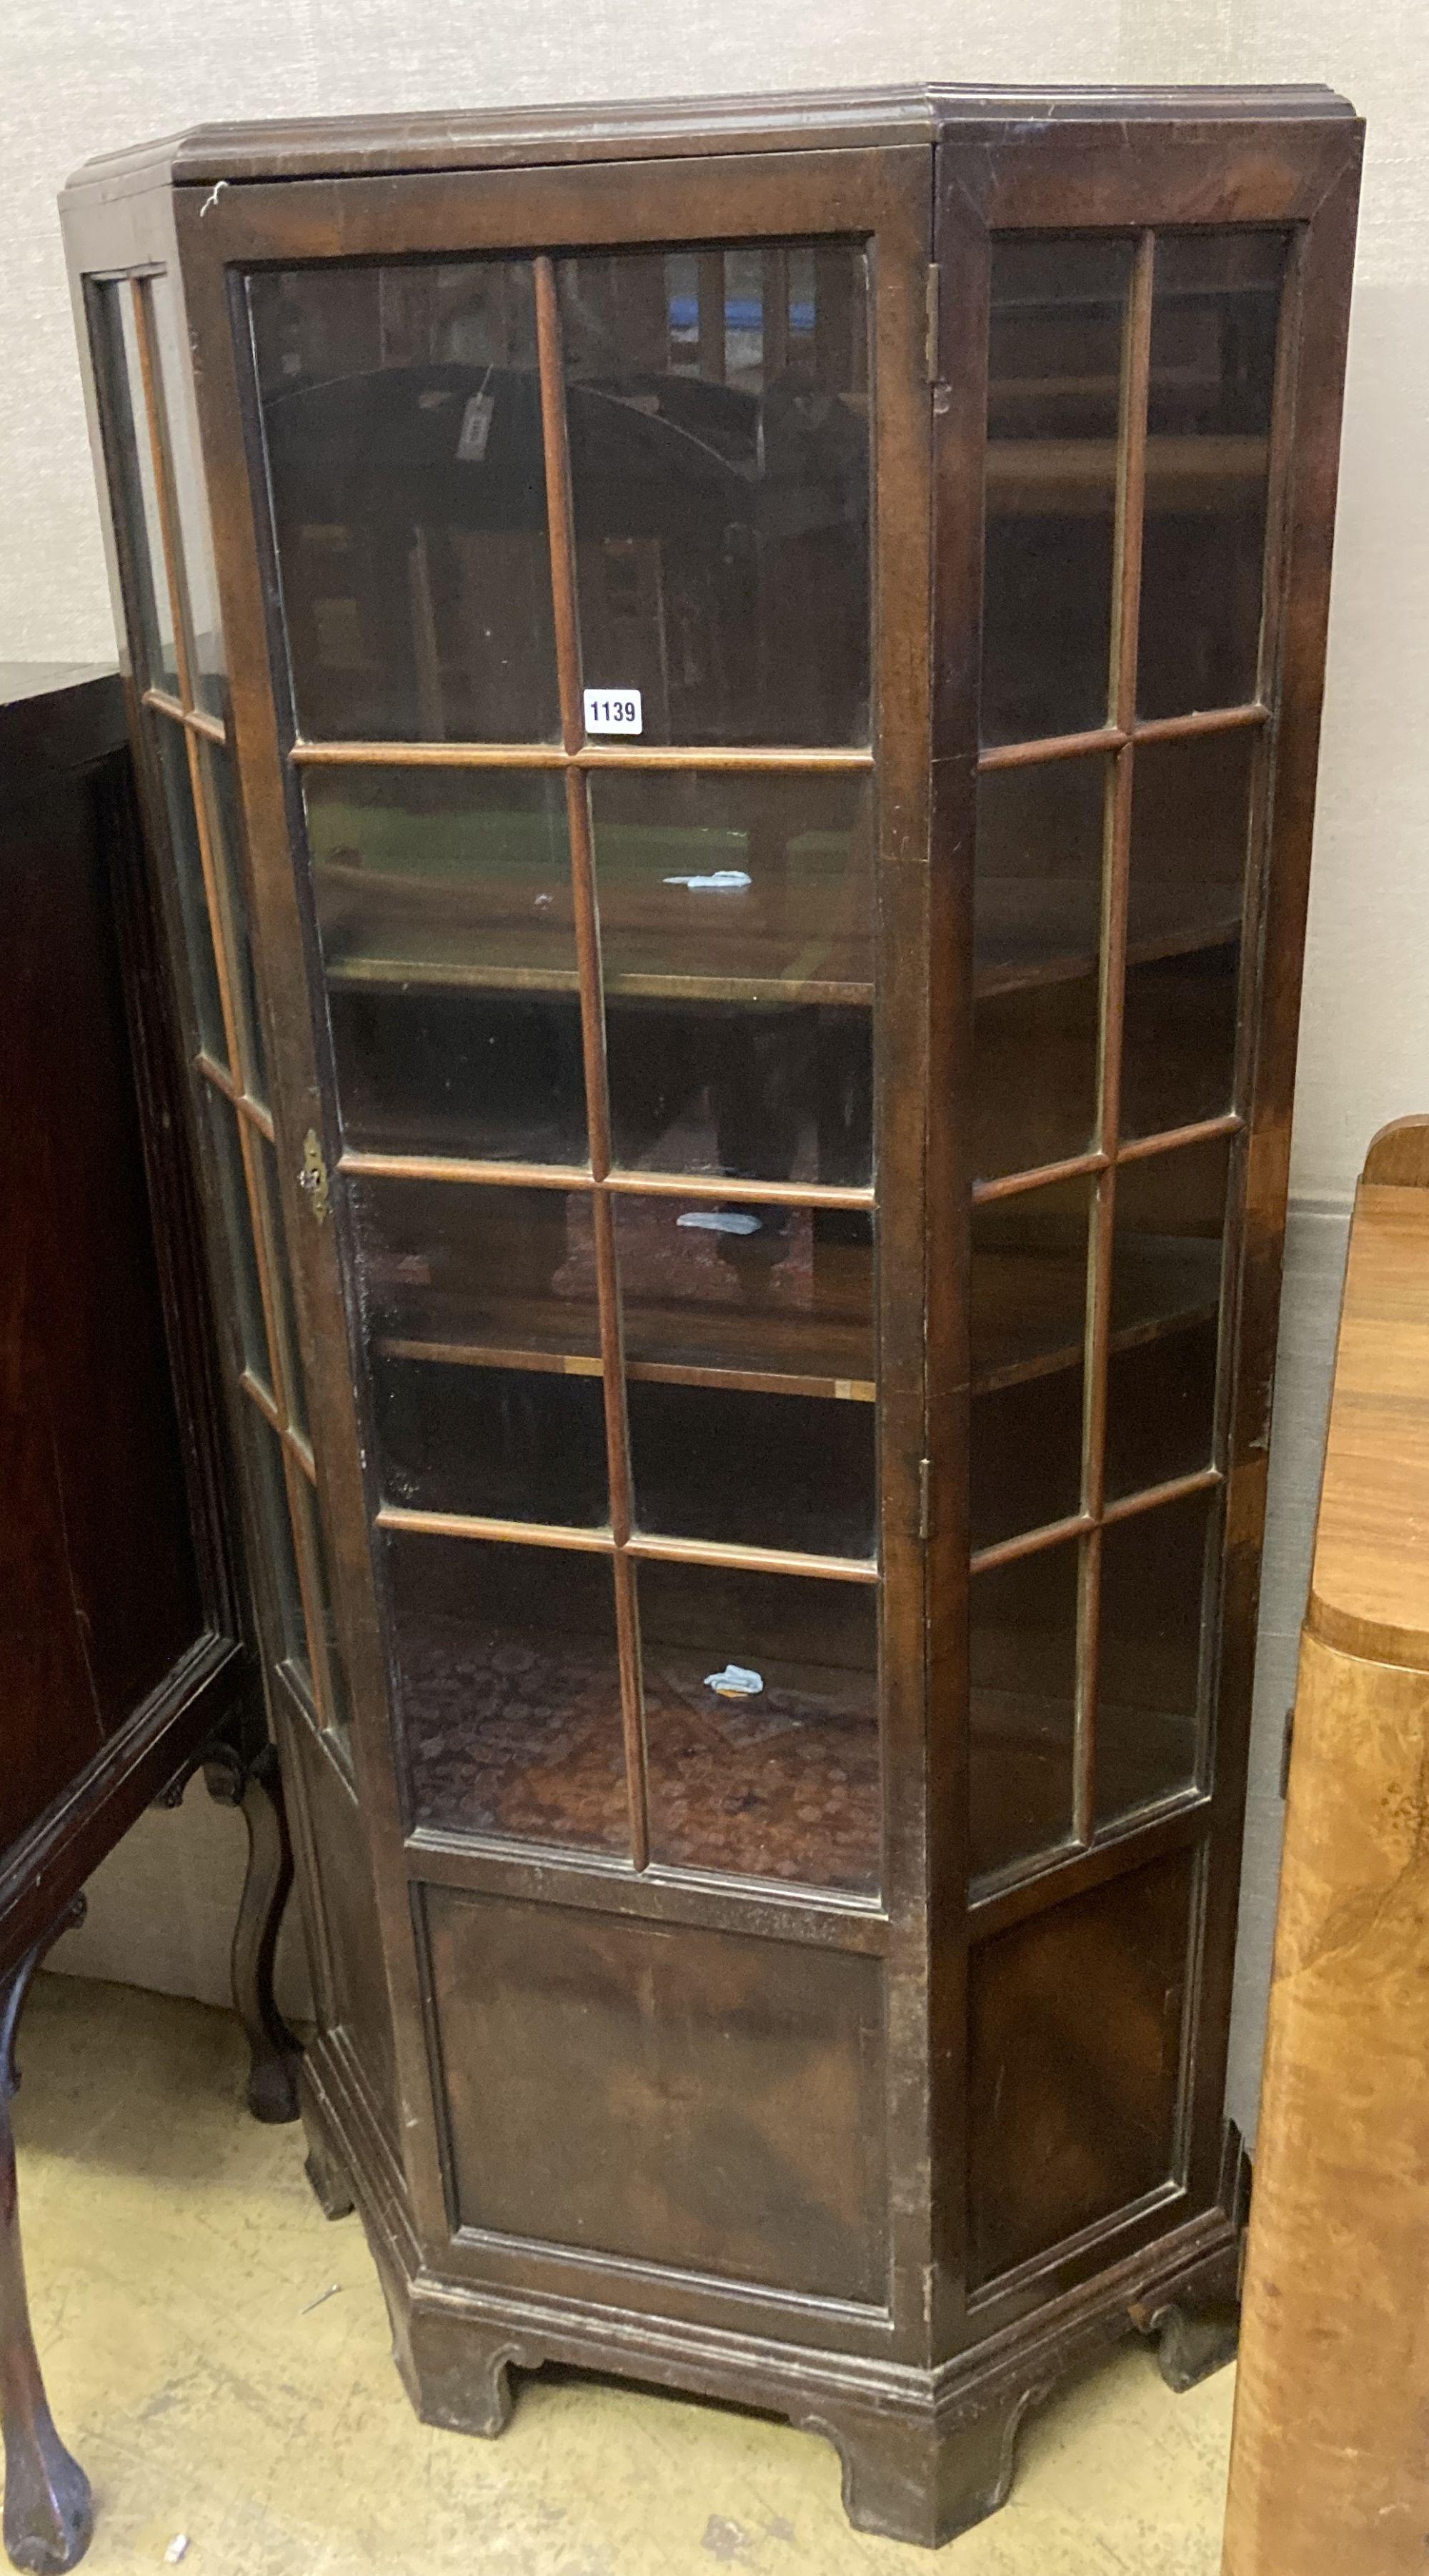 An early 20th century walnut display cabinet, width 78cm depth 30cm height 161cm